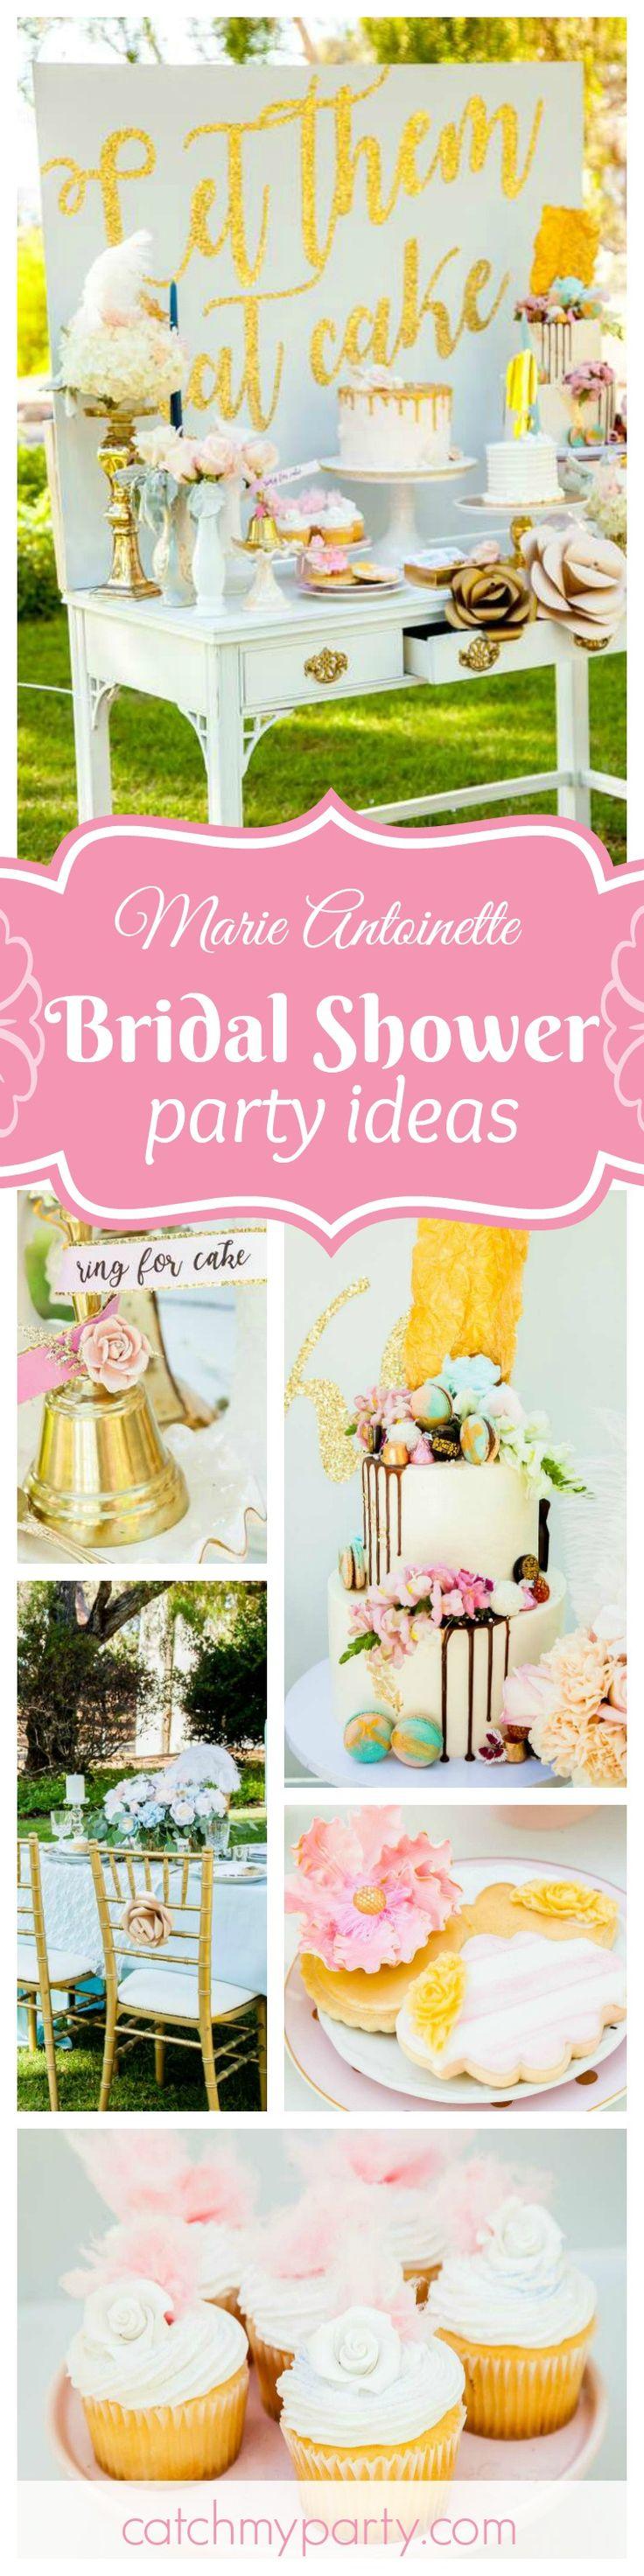 craft ideas homemade bridal shower decoration%0A Don u    t miss this gorgeous Marie Antoniette inspired garden Bridal Shower   The dessert table